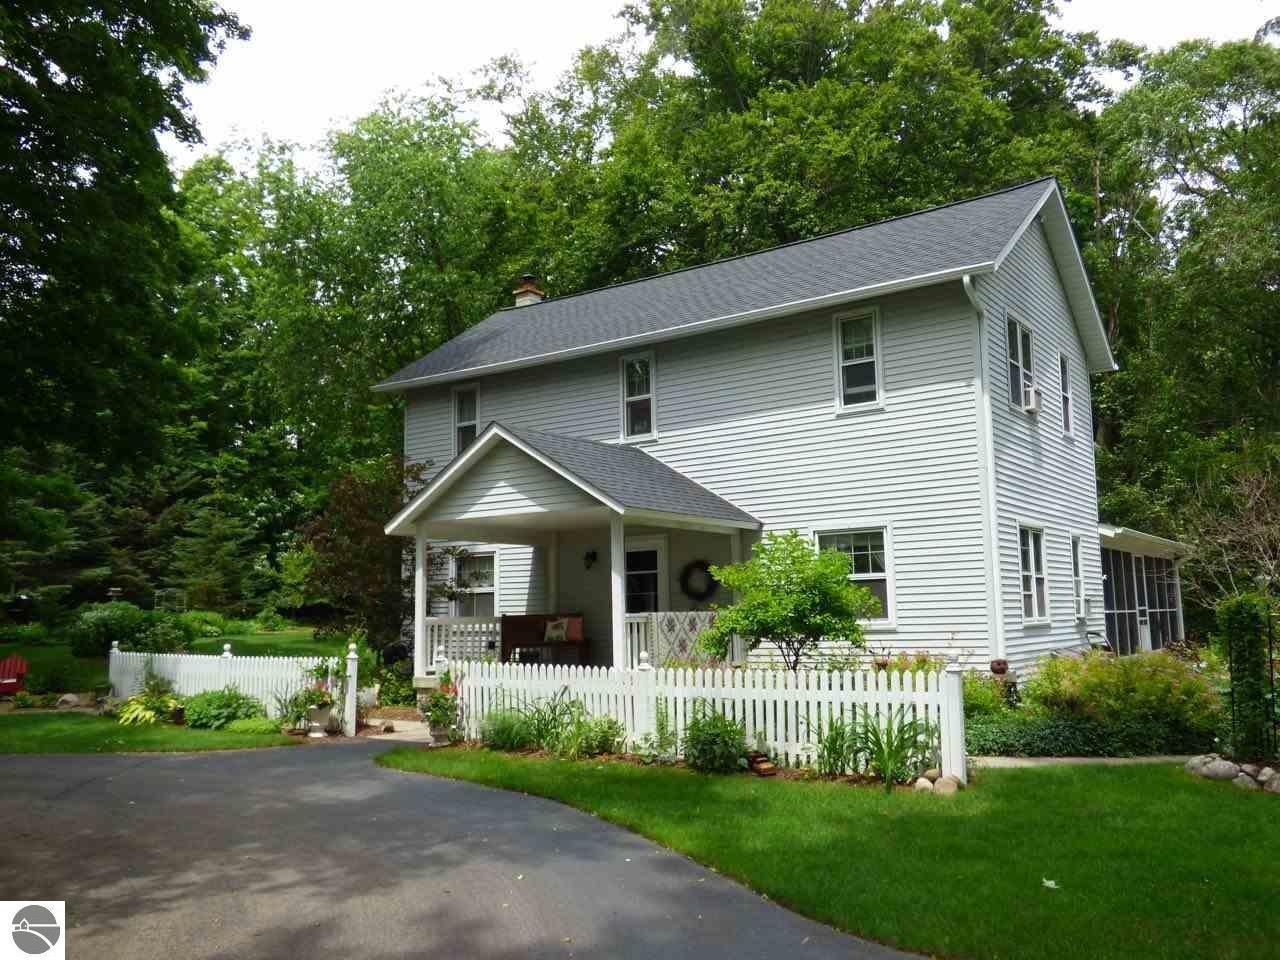 Michigan antrim county kewadin - 7855 Darmon Place